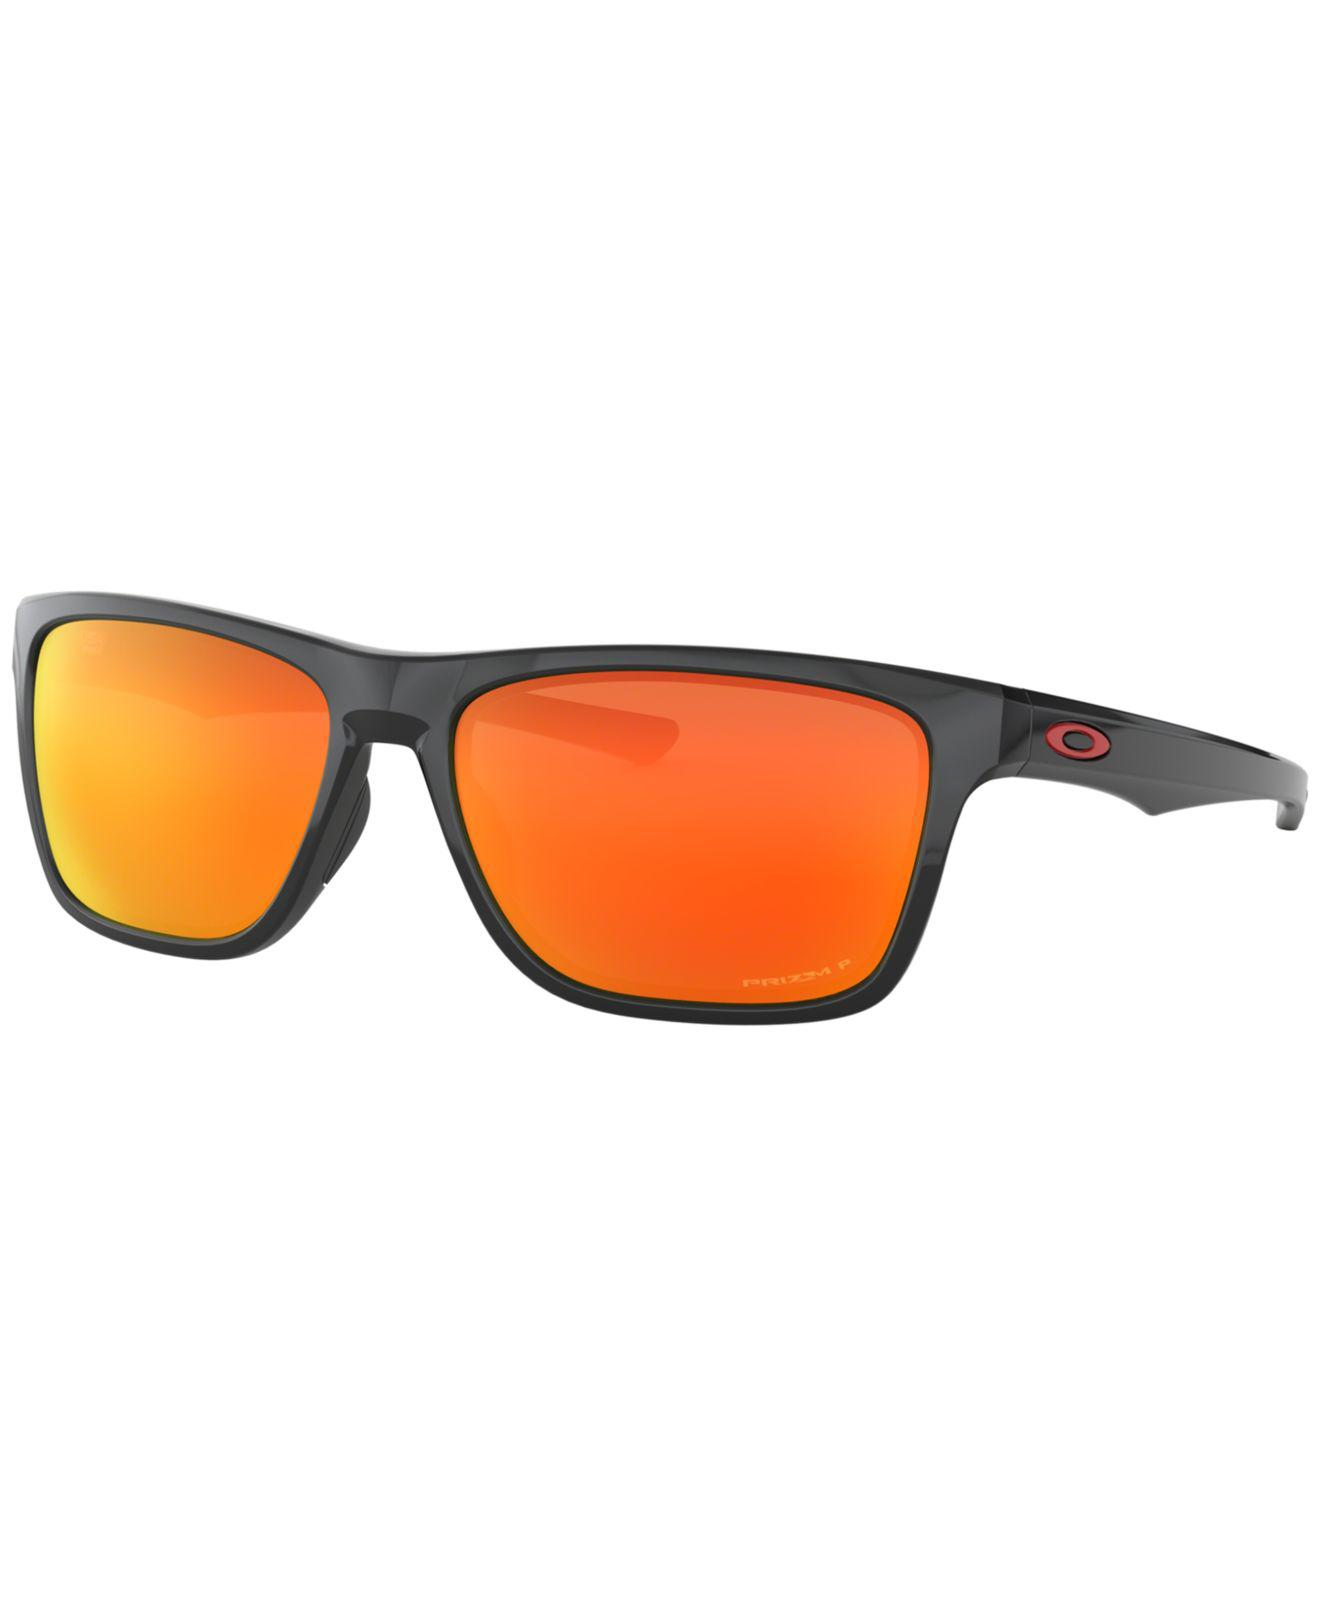 4d90c2c64c Oakley. Men s Holston Sunglasses ...